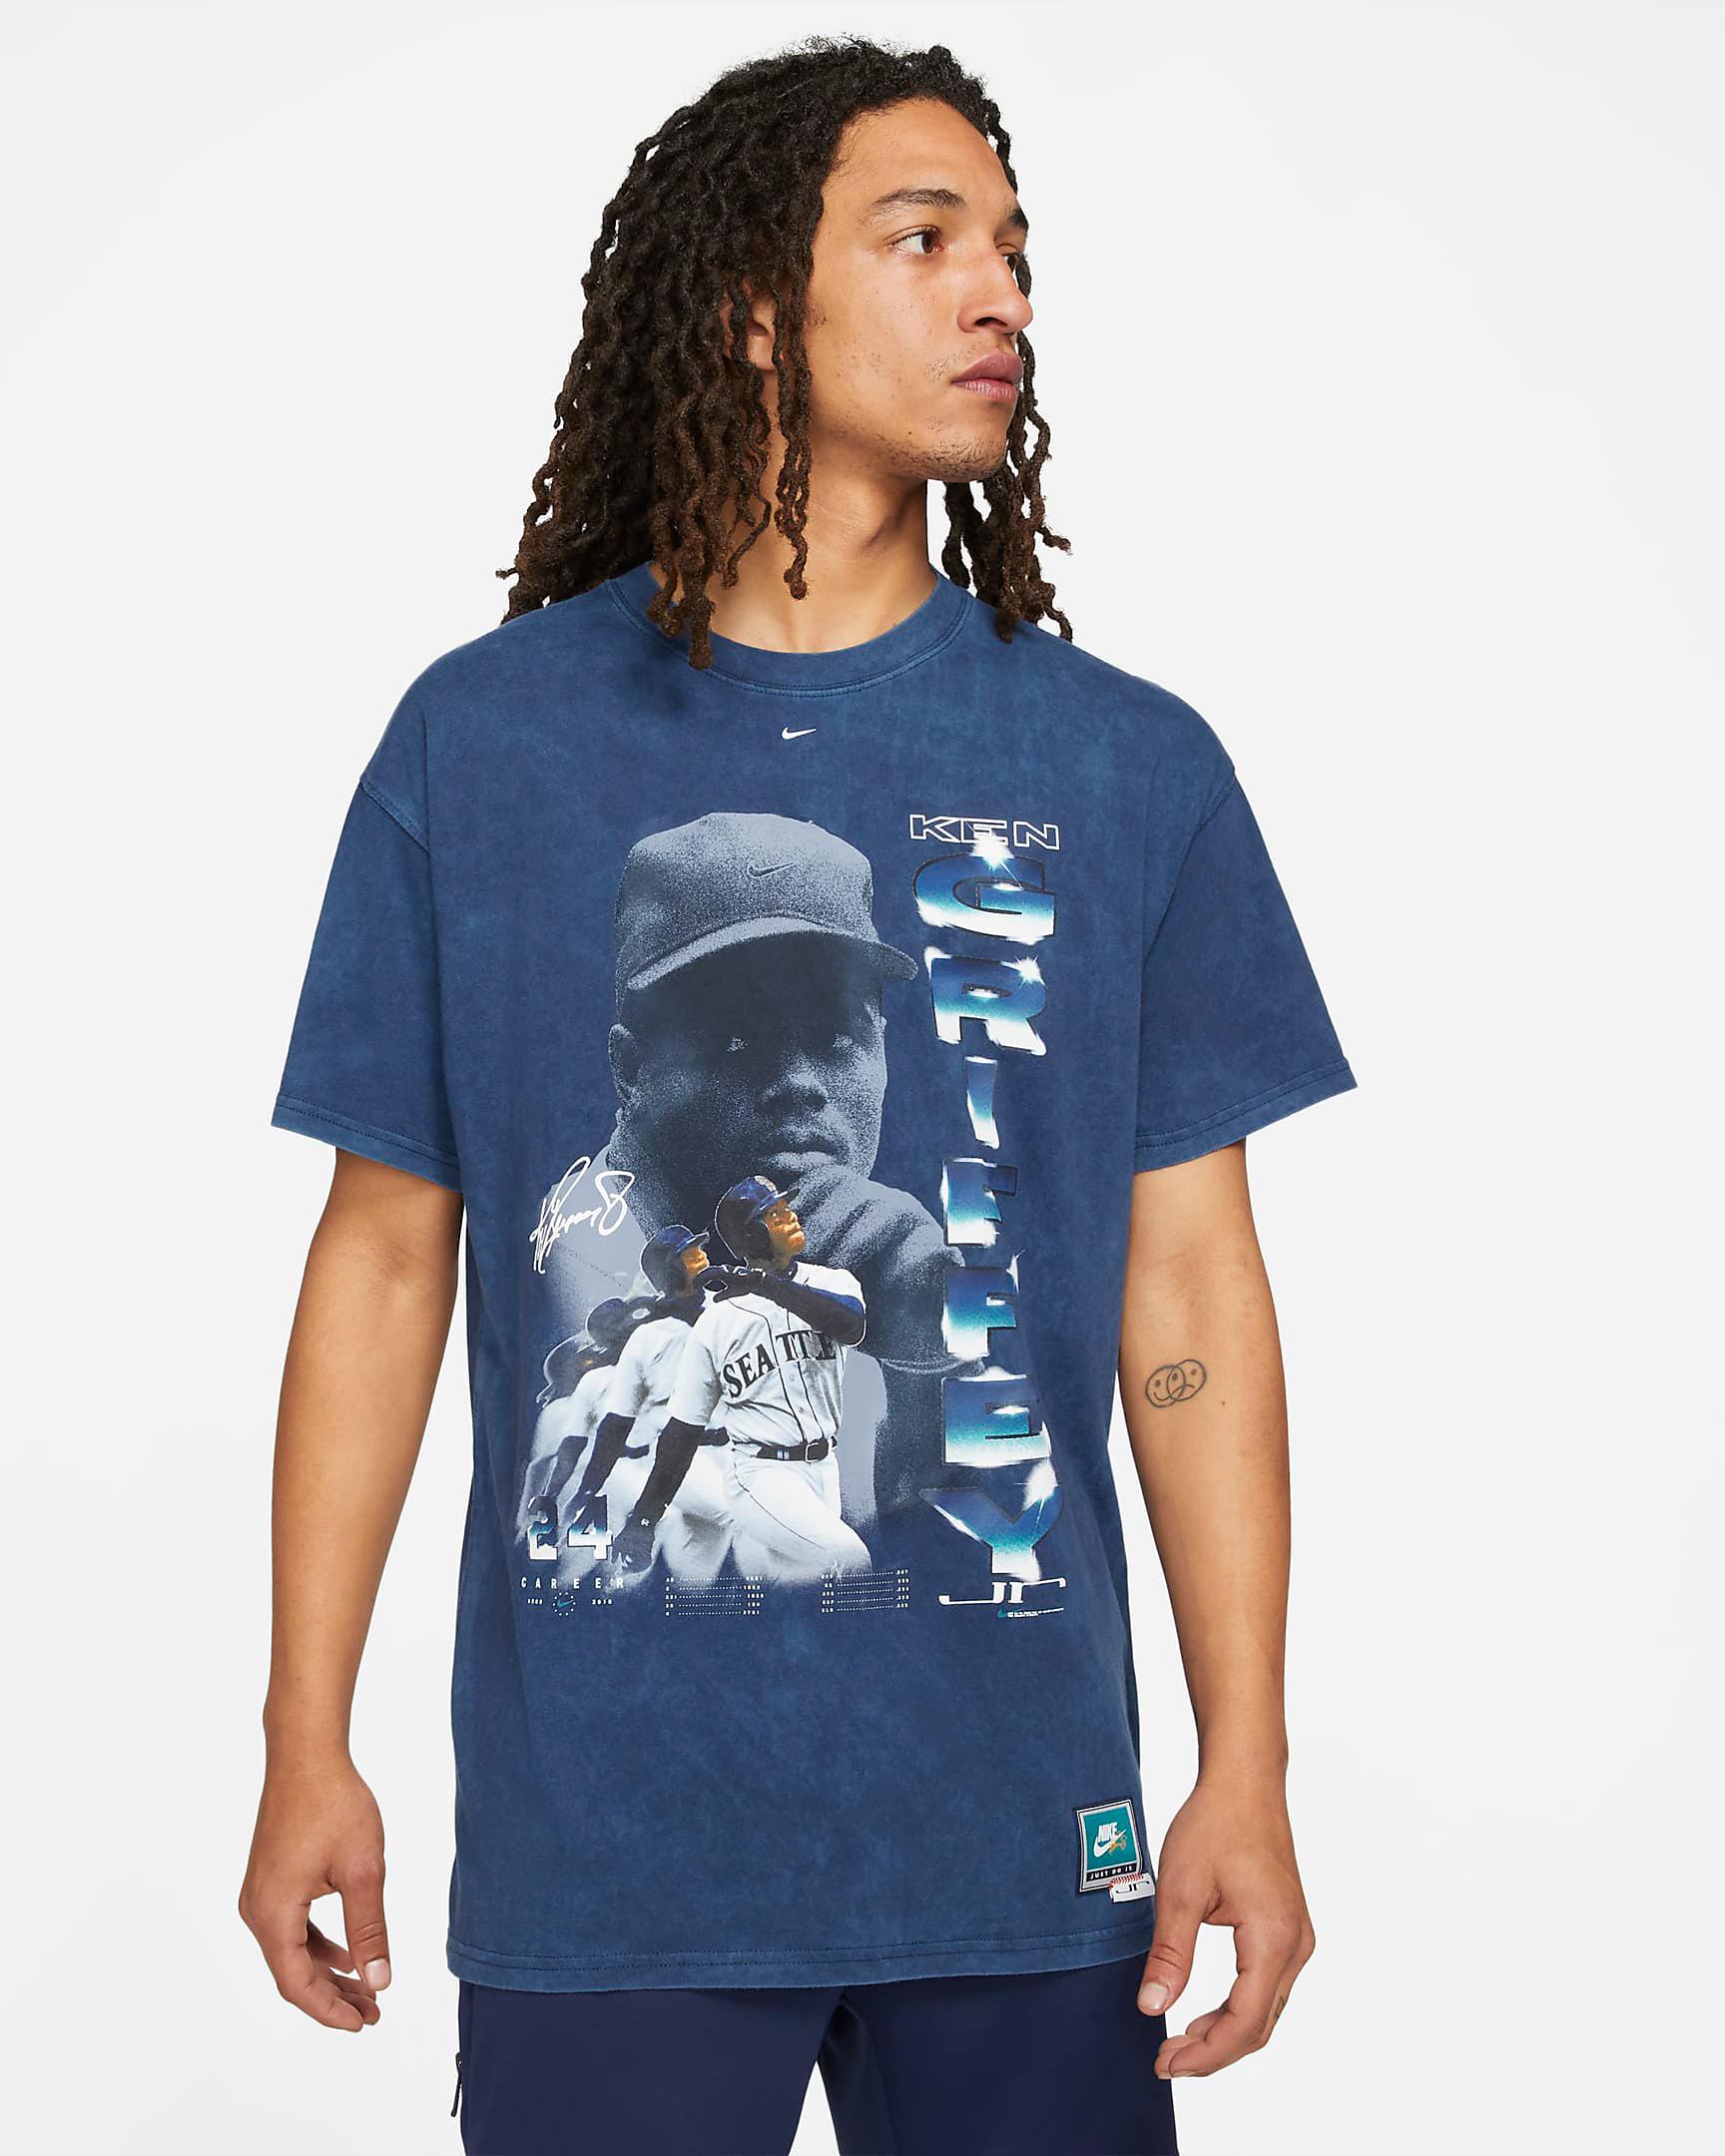 nike-ken-griffey-jr-swingman-shirt-navy